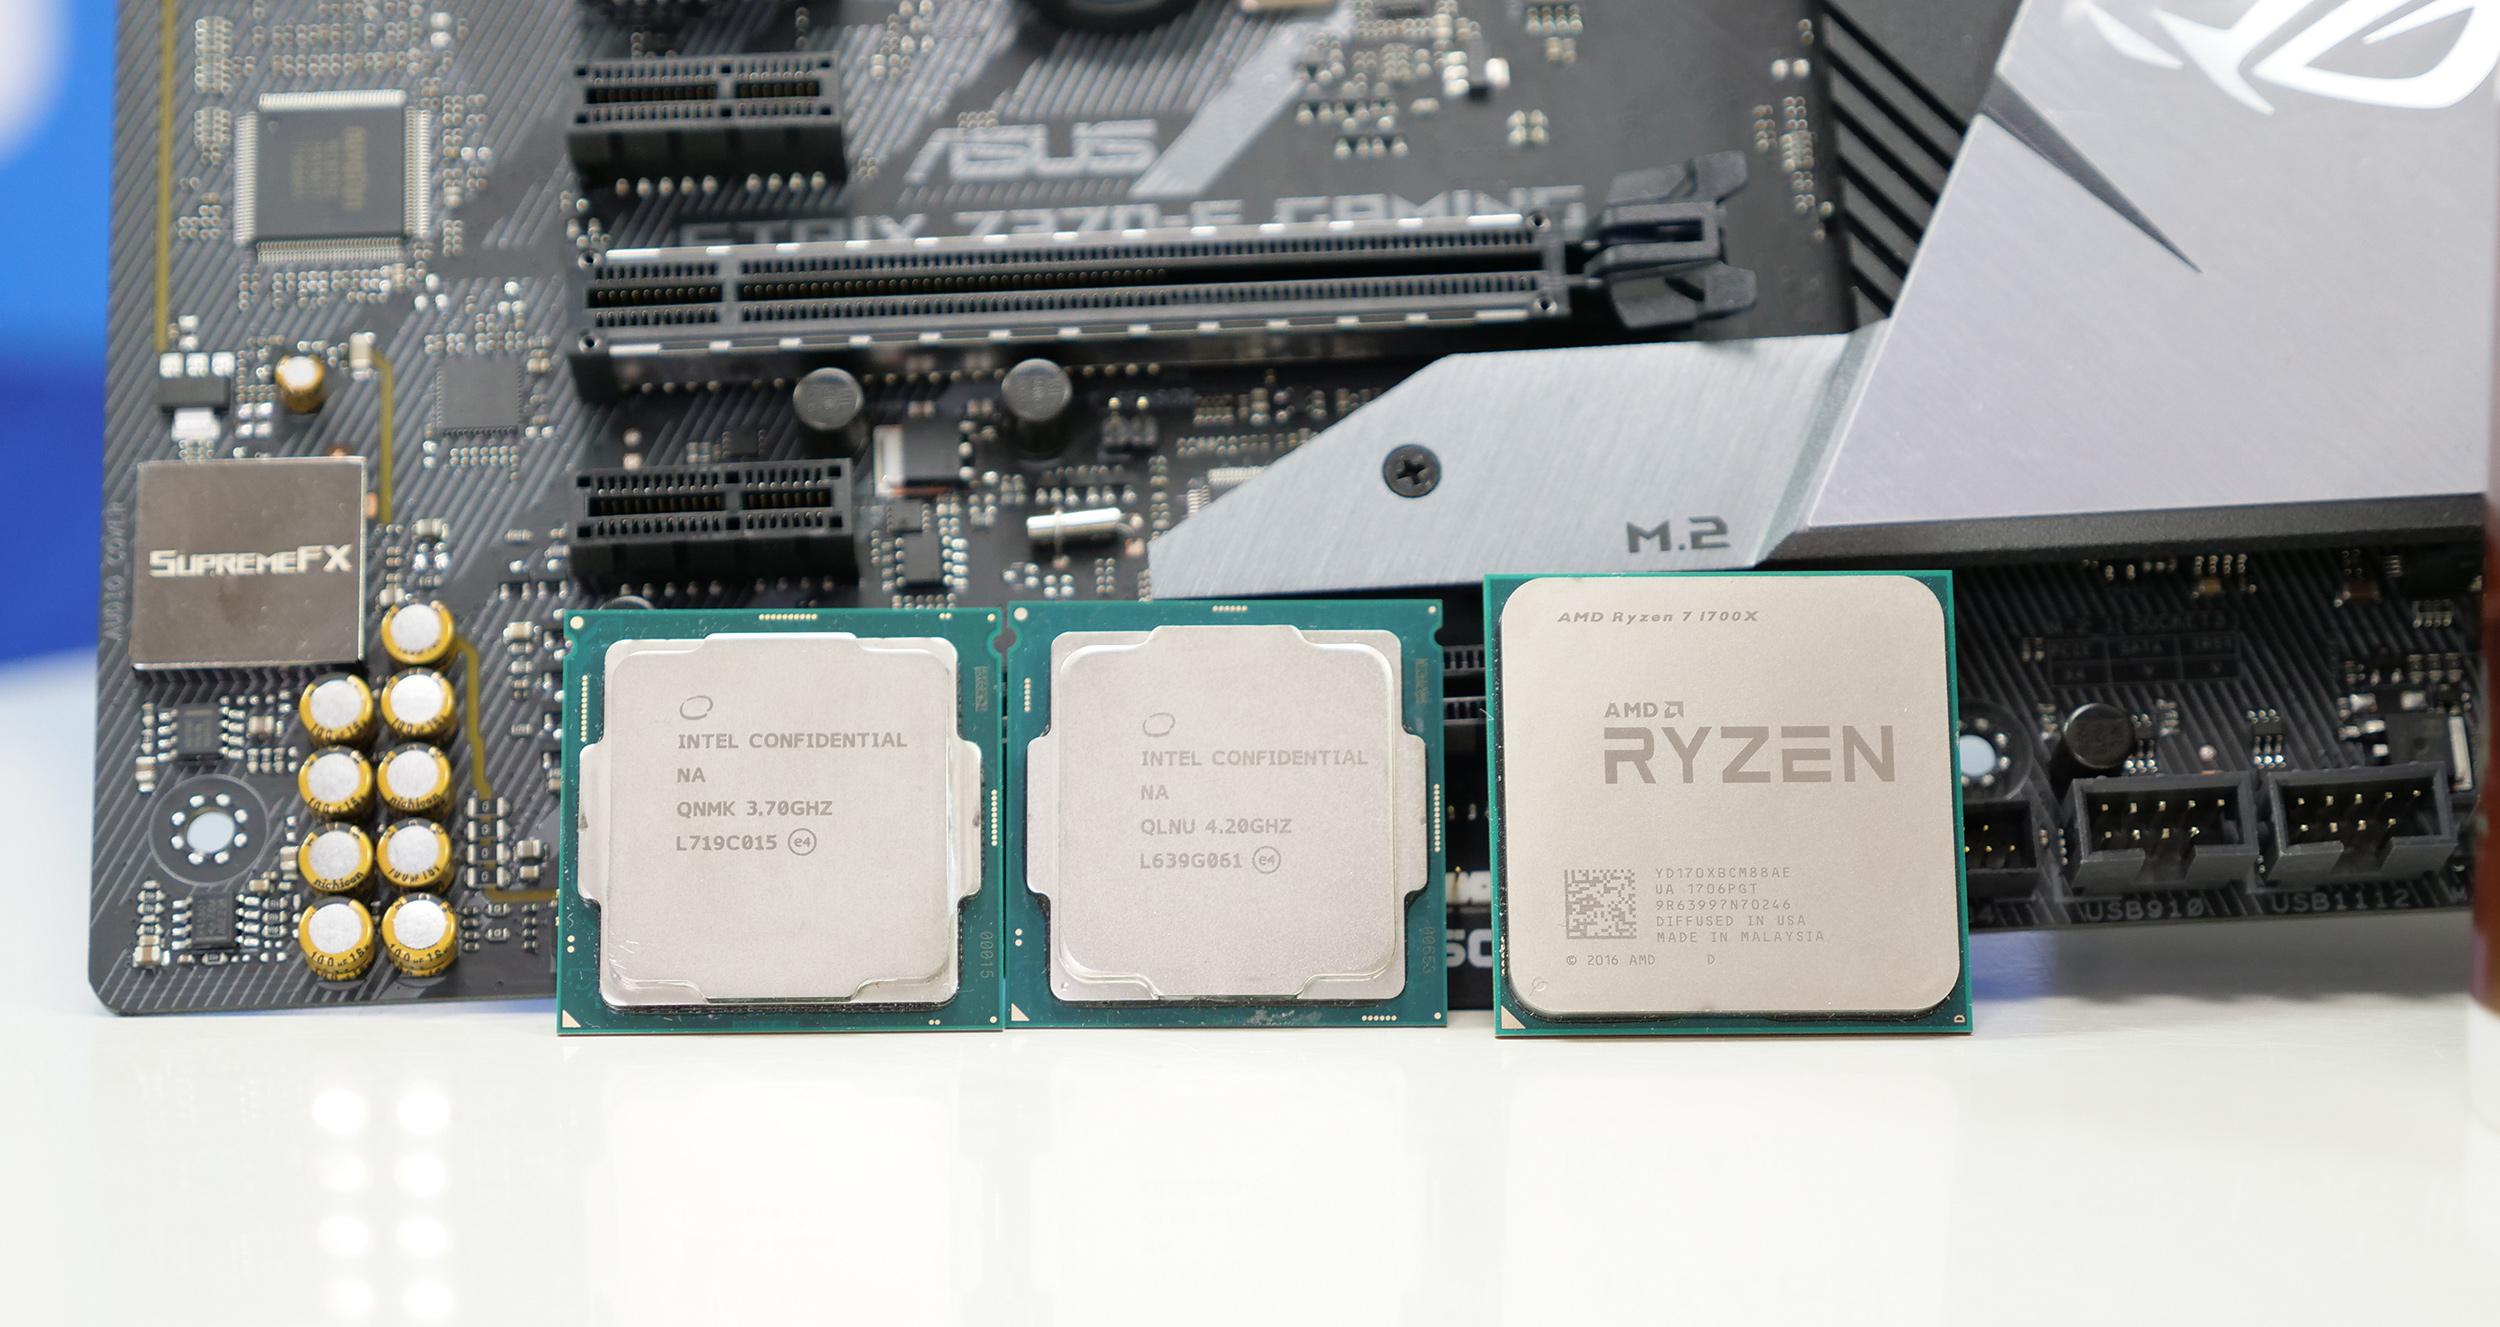 Billigare processorer